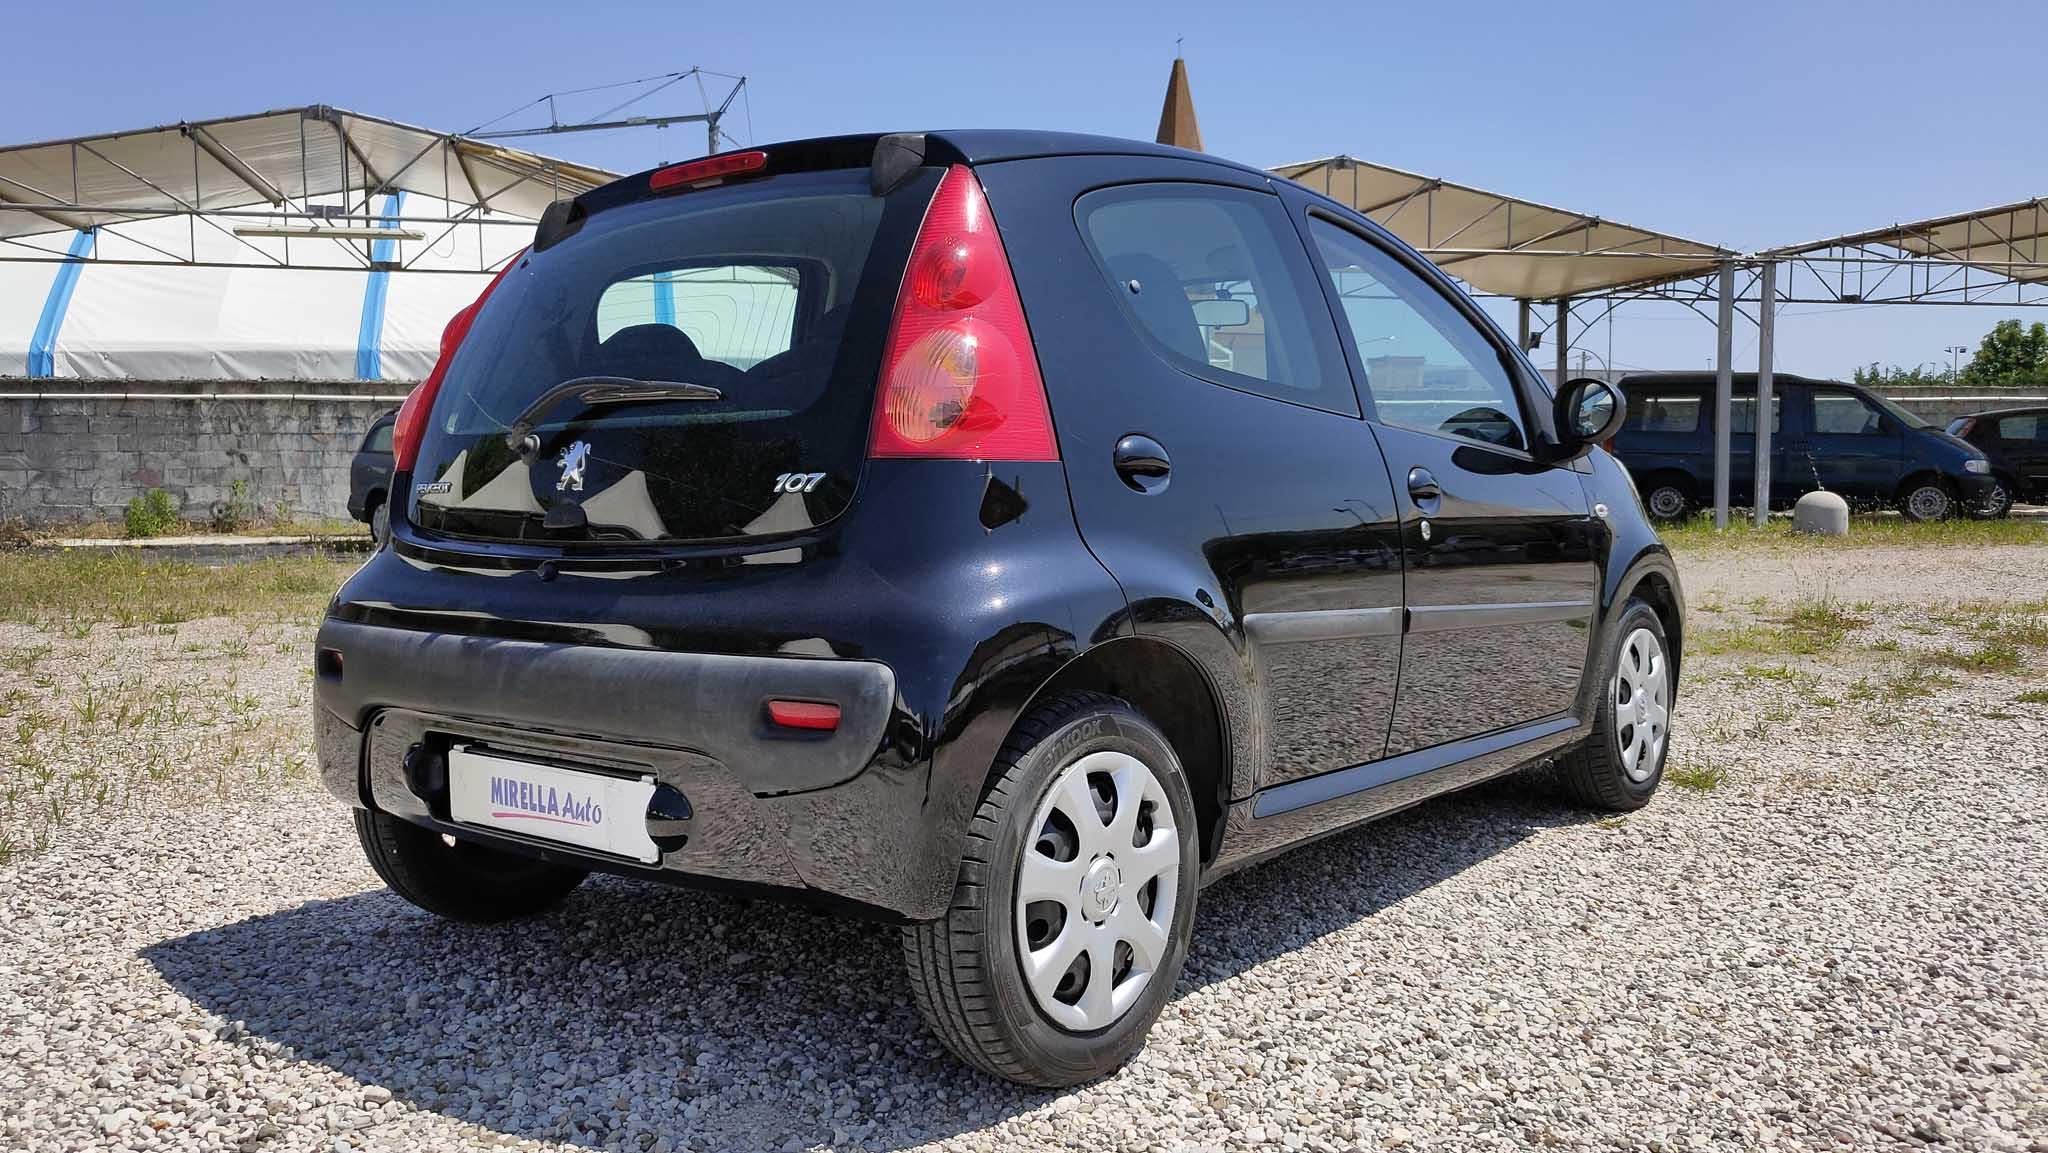 107-nera-mirella-auto-8